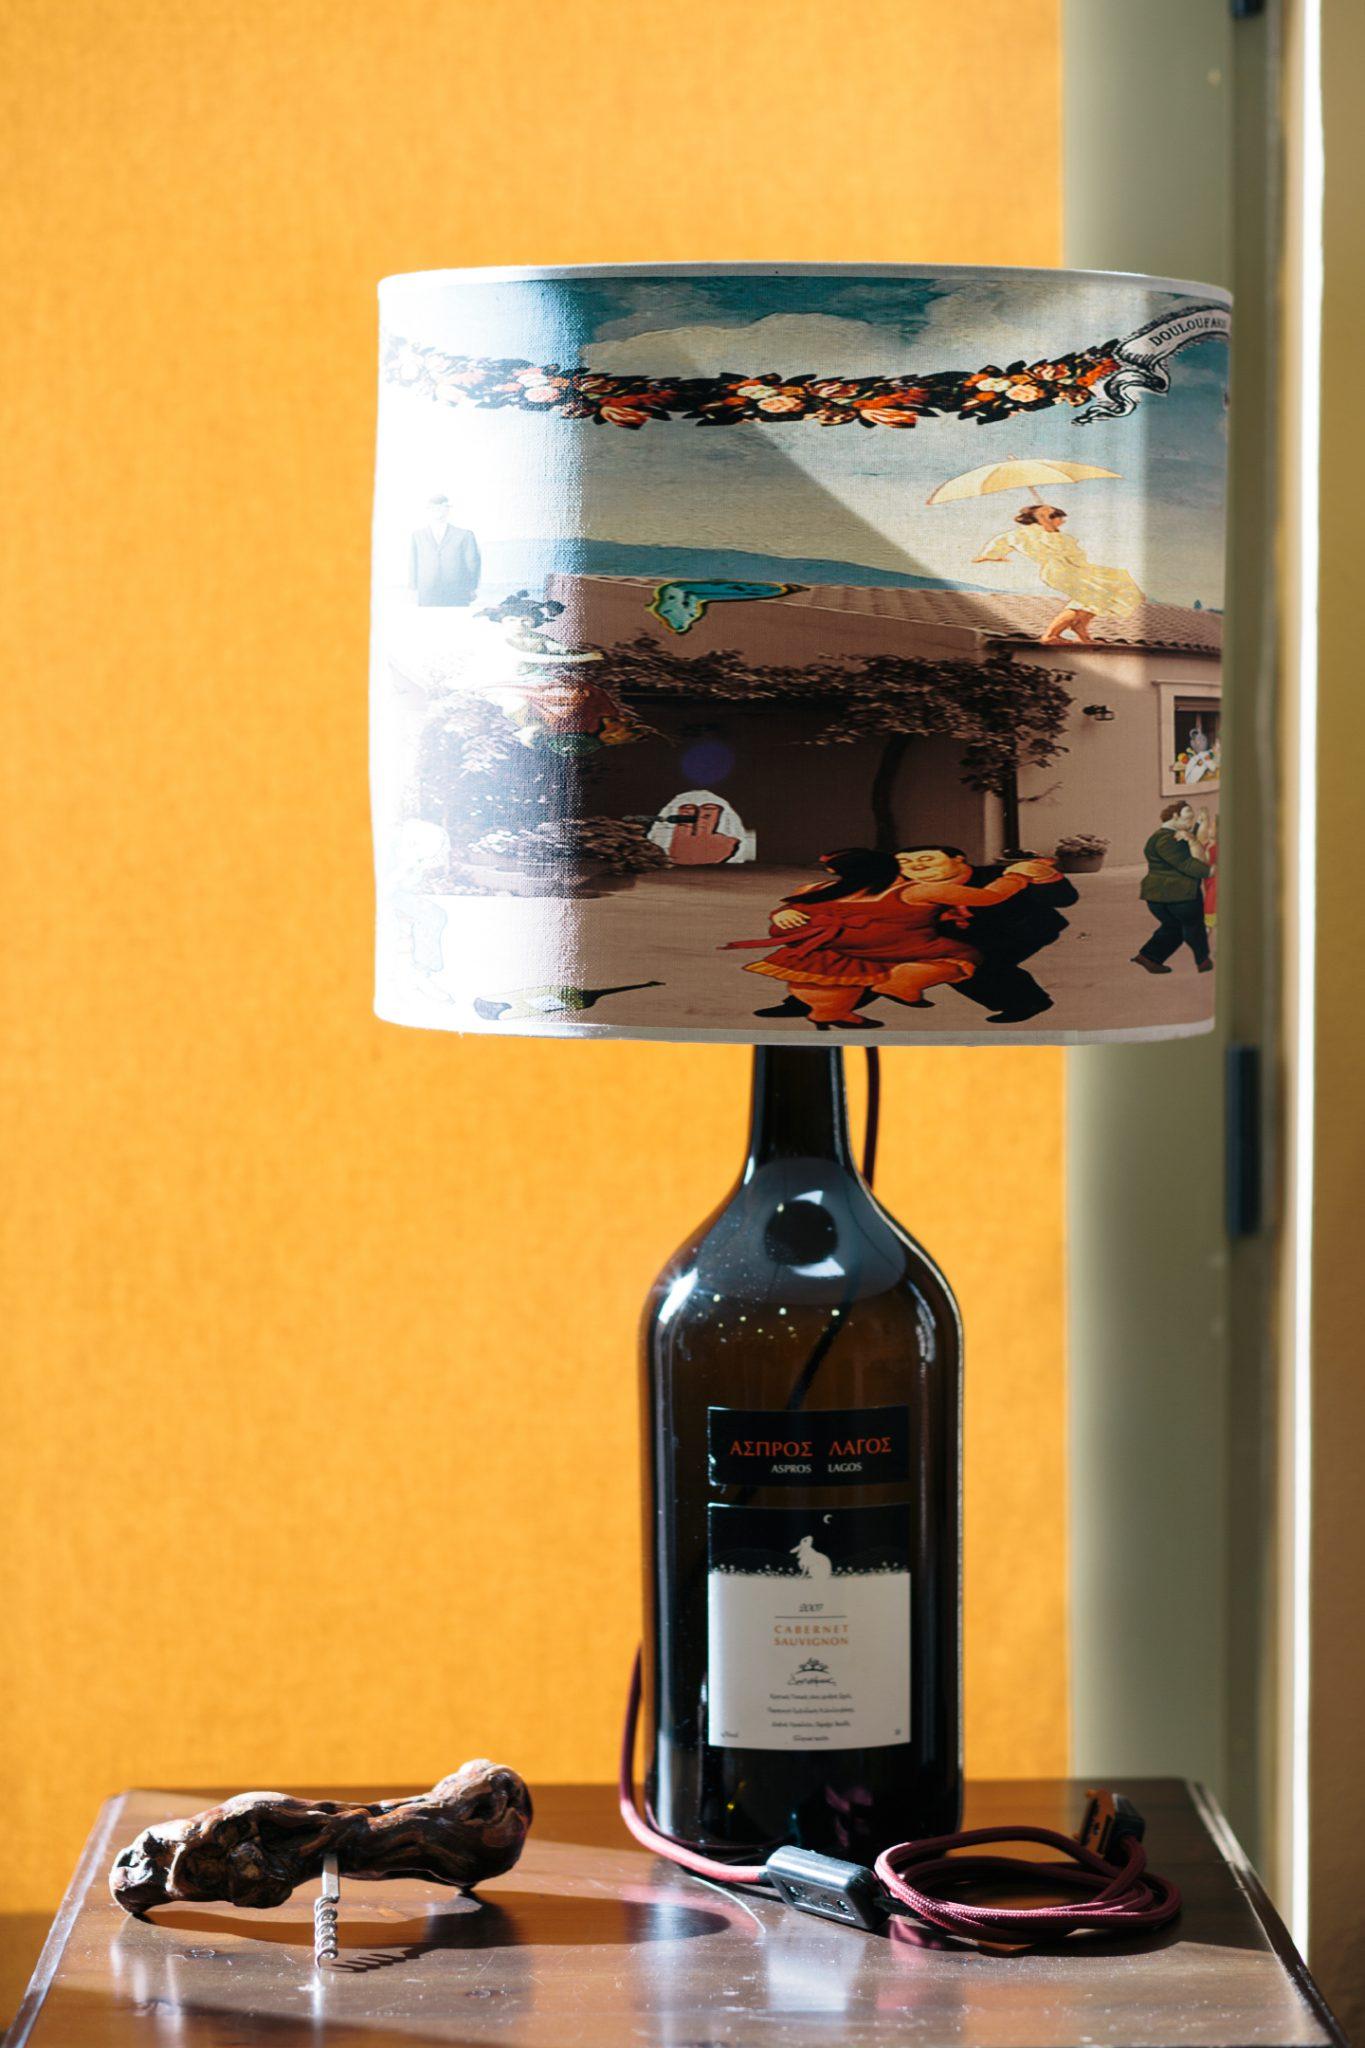 douloufakis-winery-crete-20